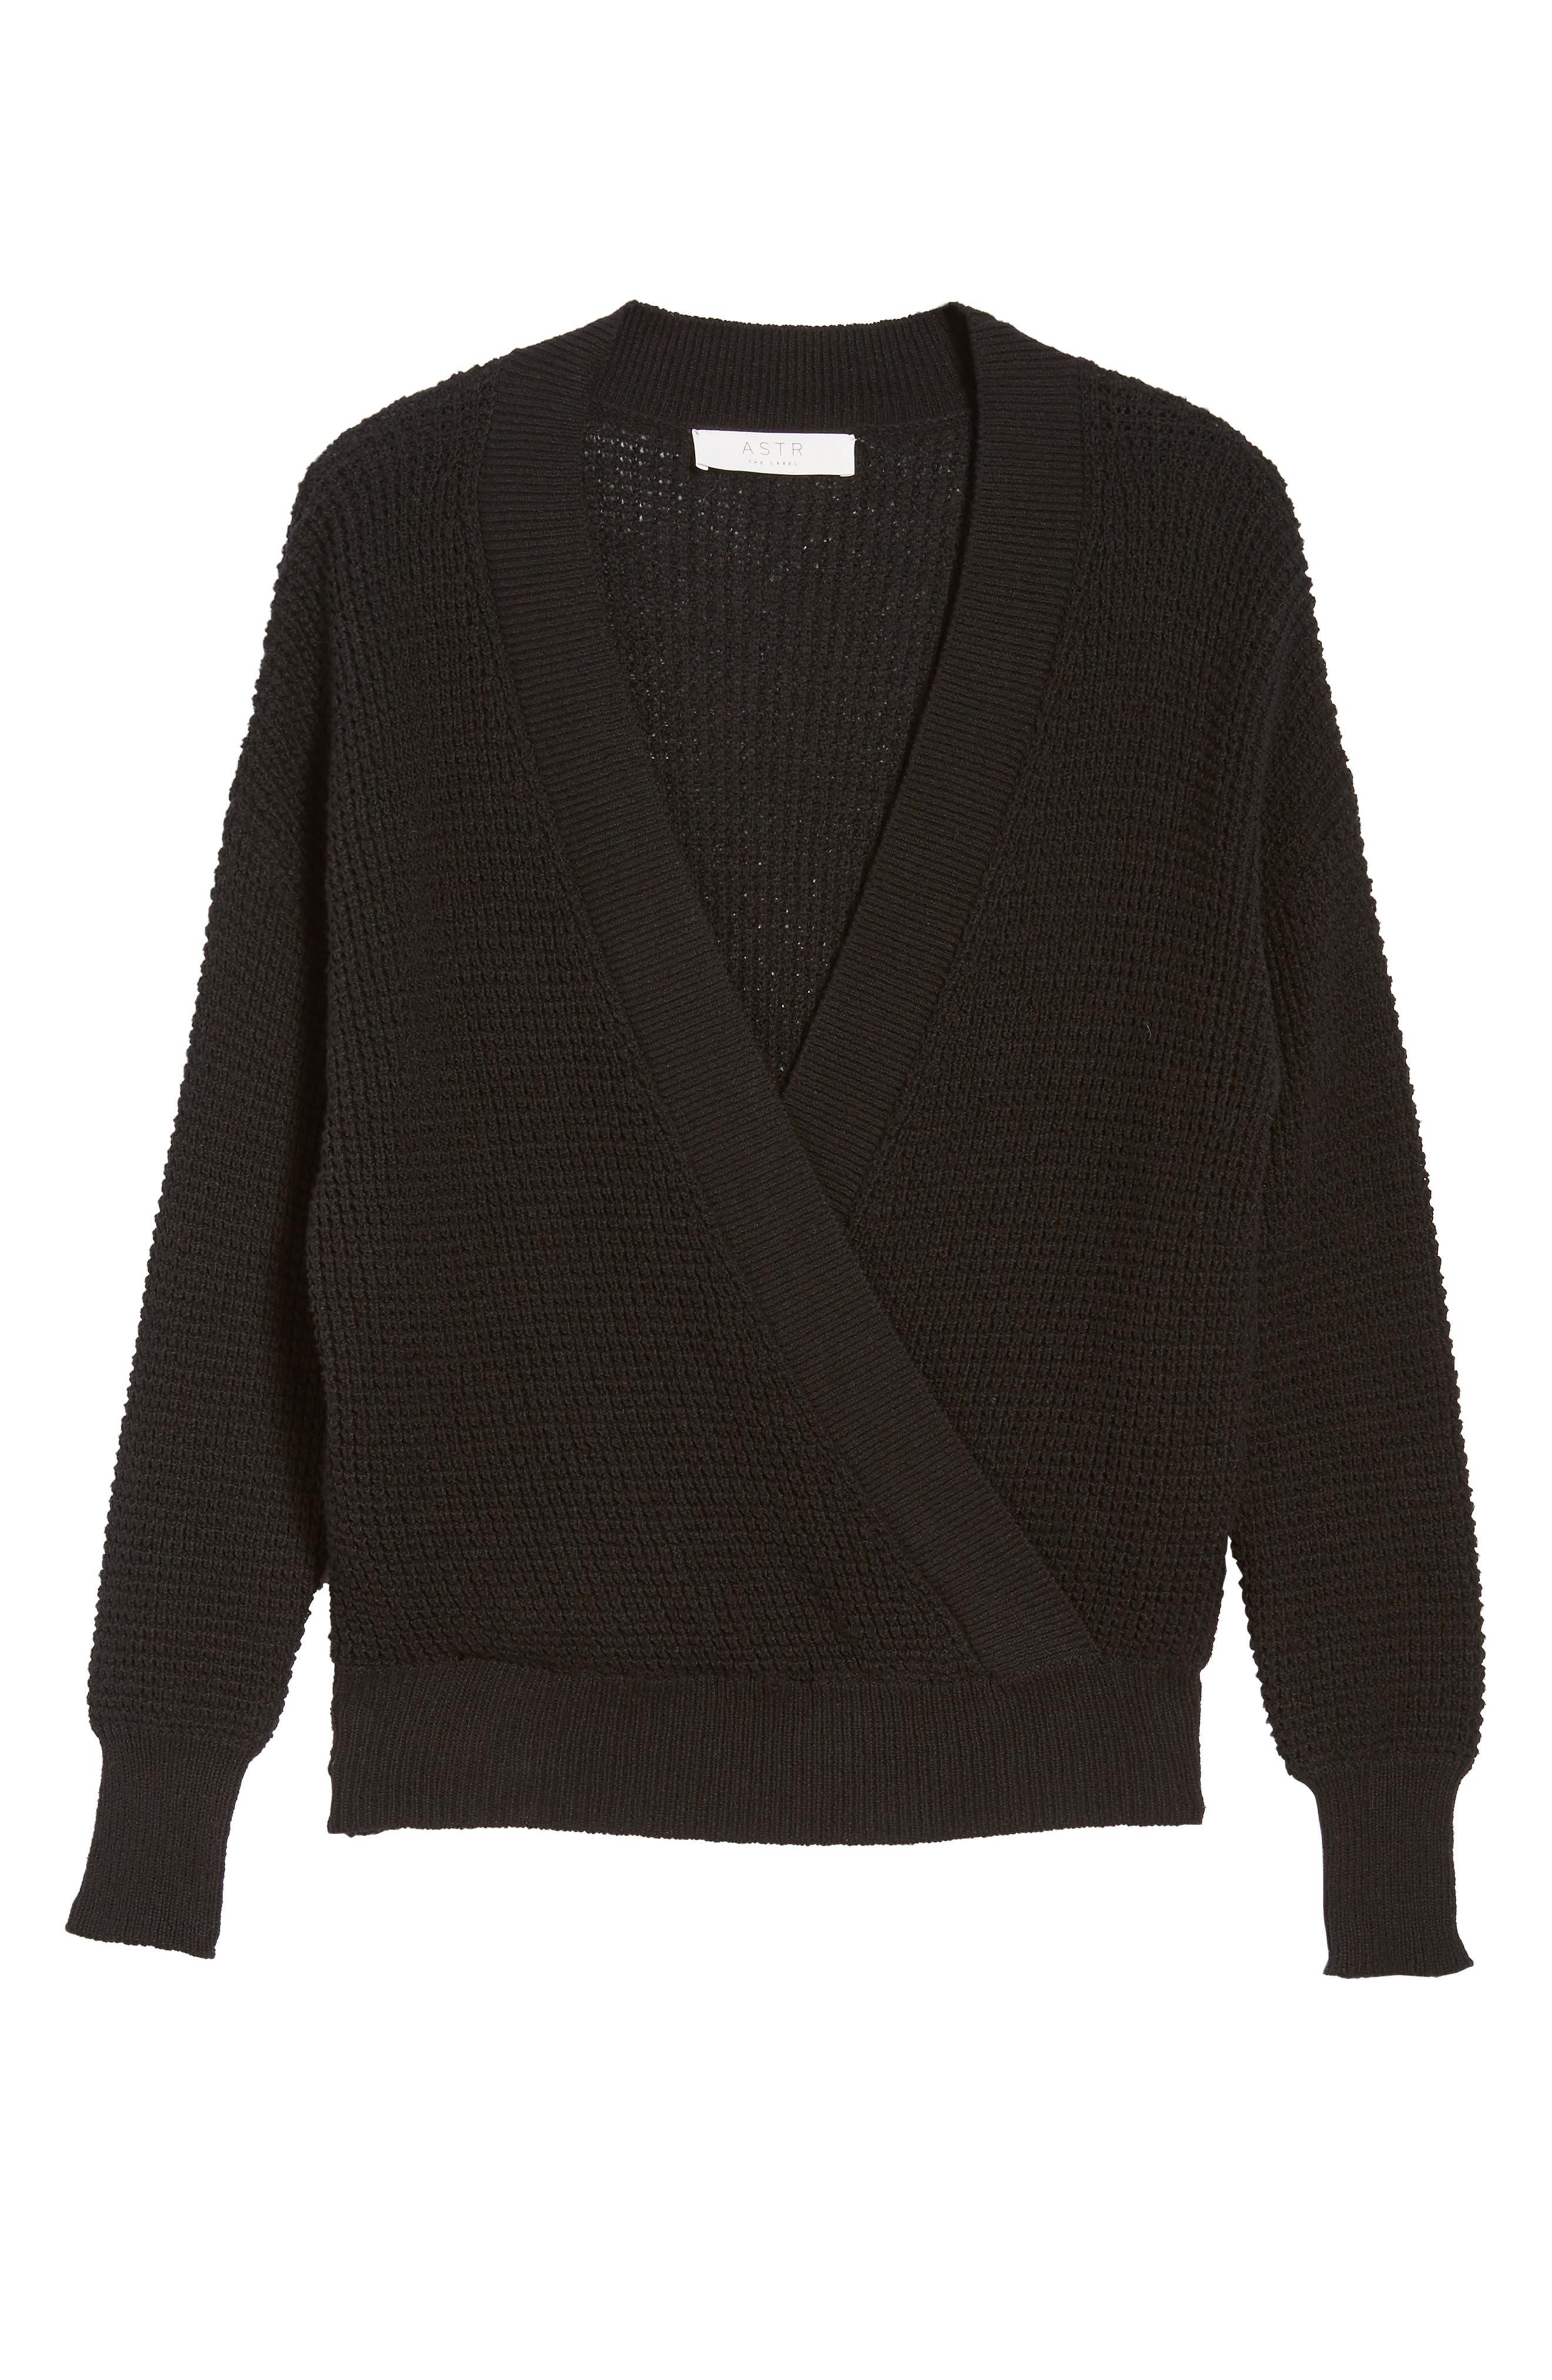 Stephanie Surplice Sweater,                             Alternate thumbnail 6, color,                             001